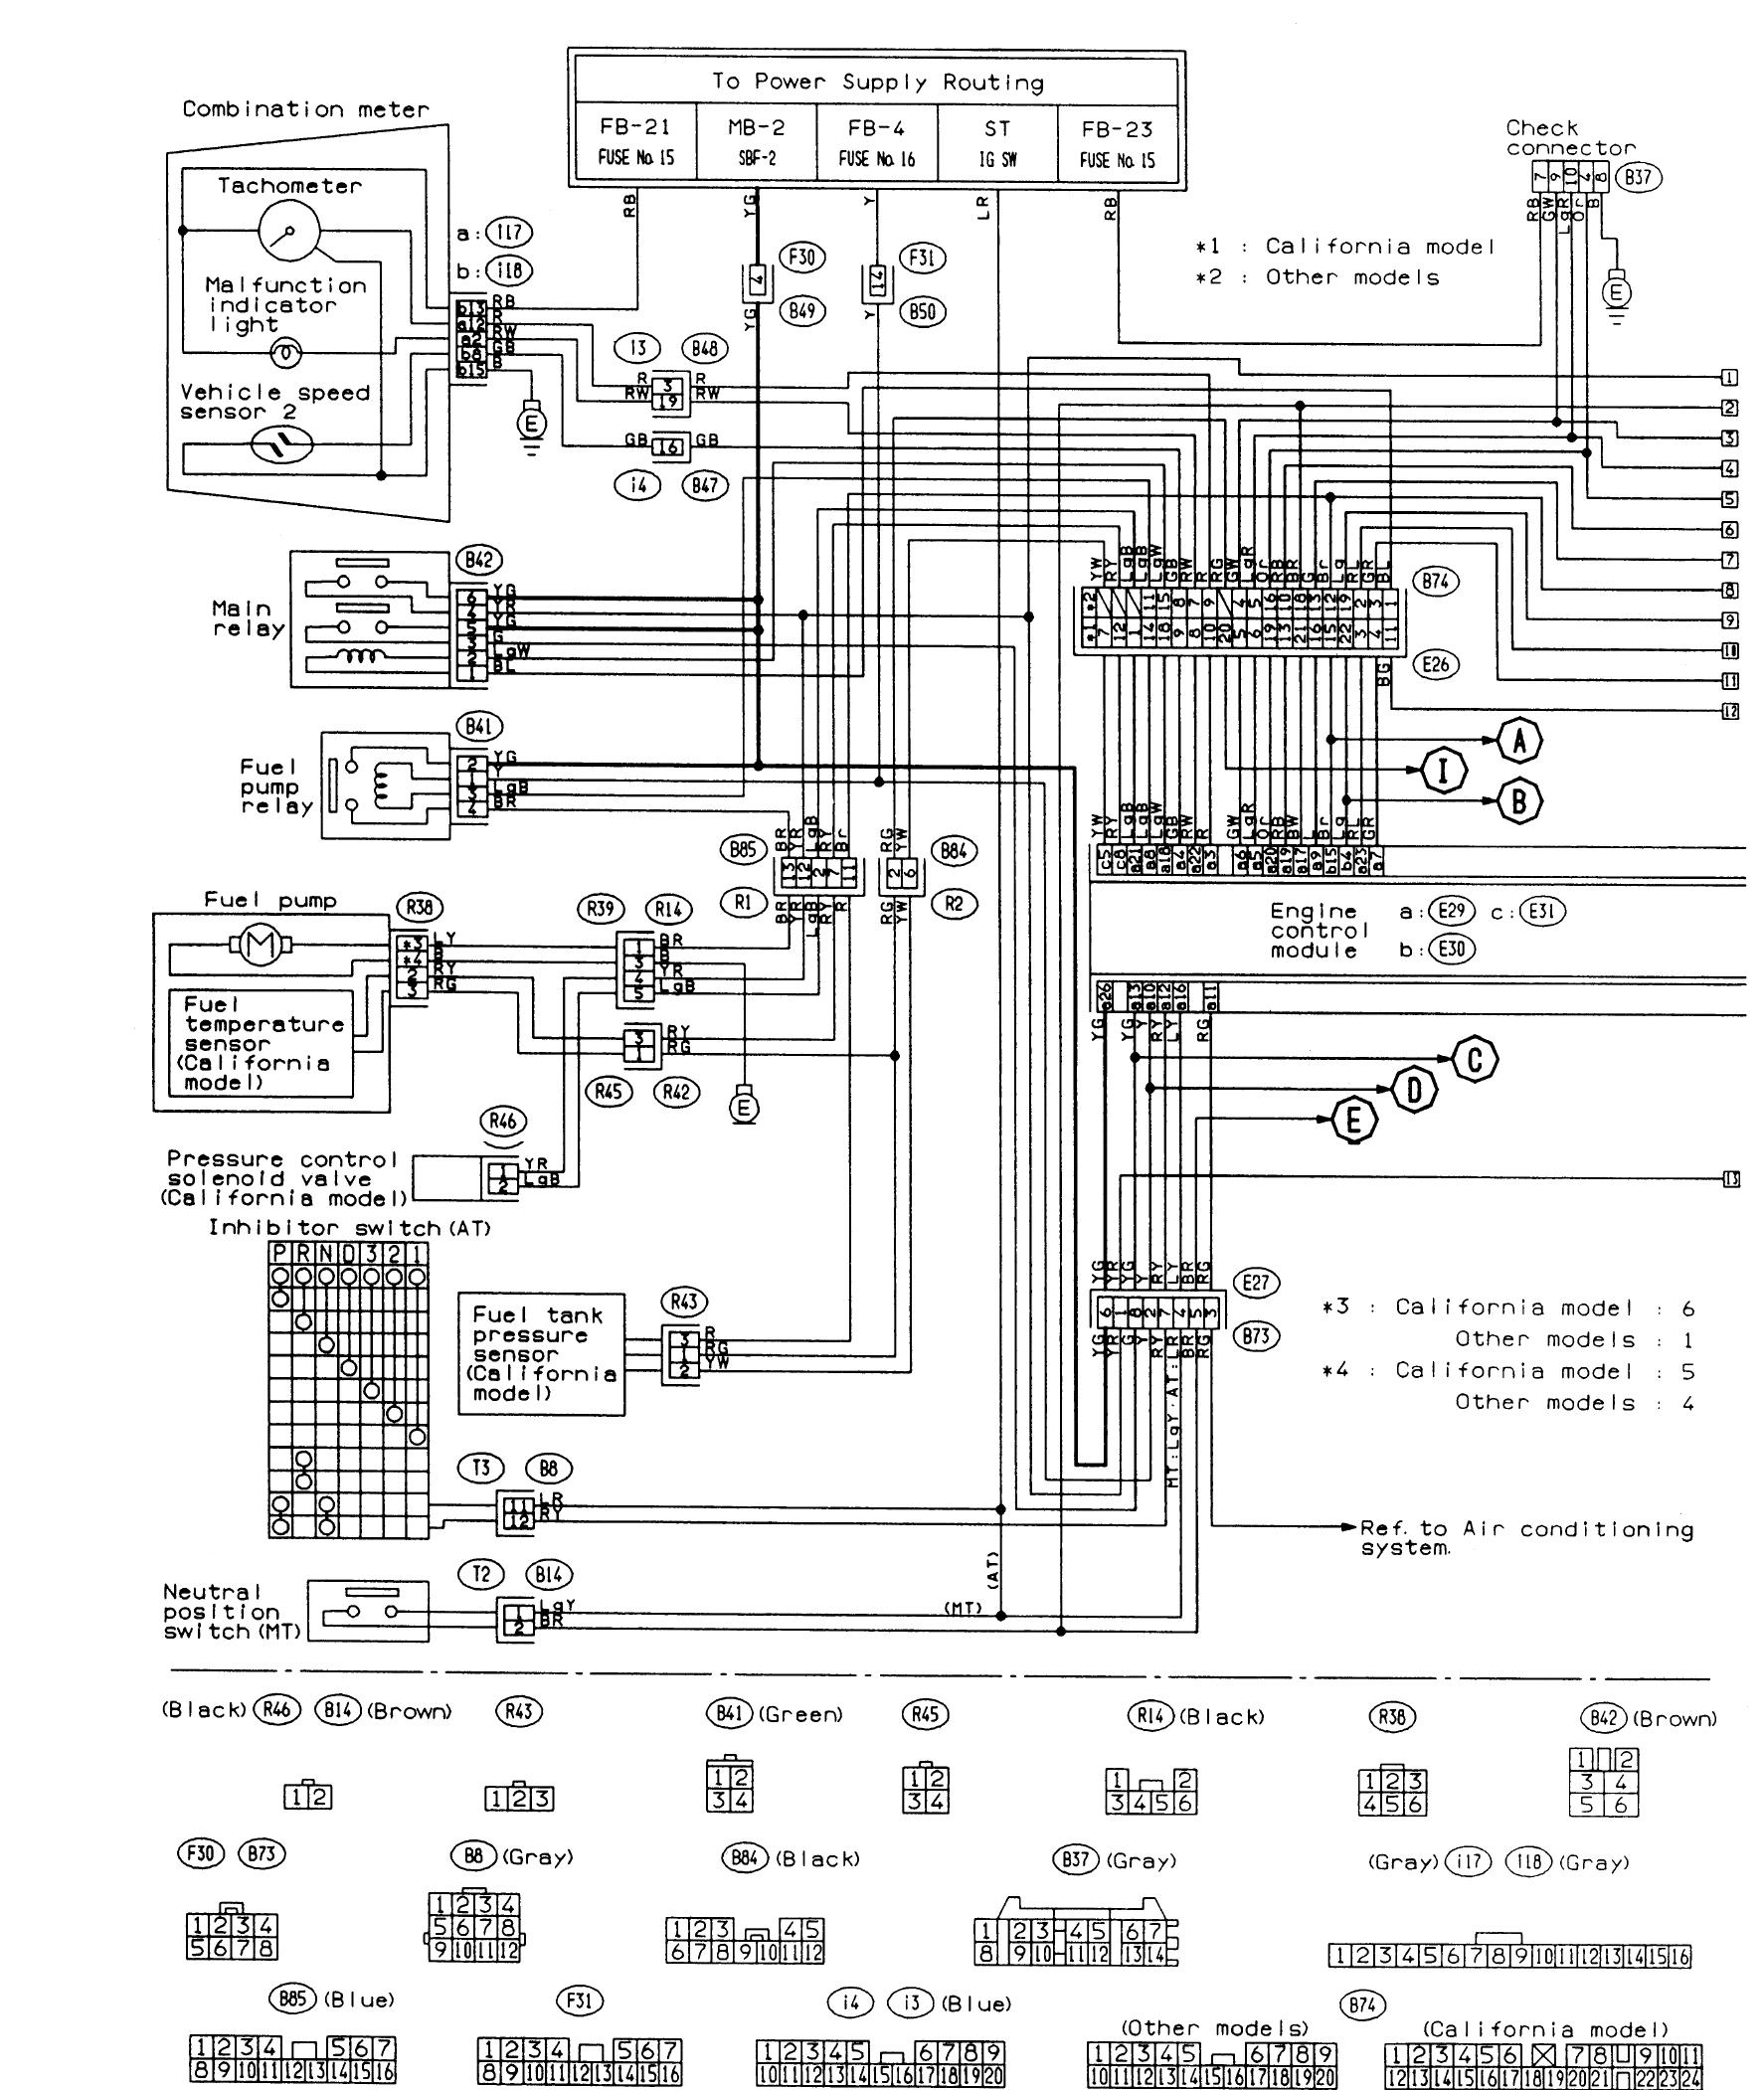 Unique How To Read Electrical Schematics Diagram Wiringdiagram Diagramming Diagramm Visuals Visualisation Graph Subaru Subaru Impreza Electrical Diagram